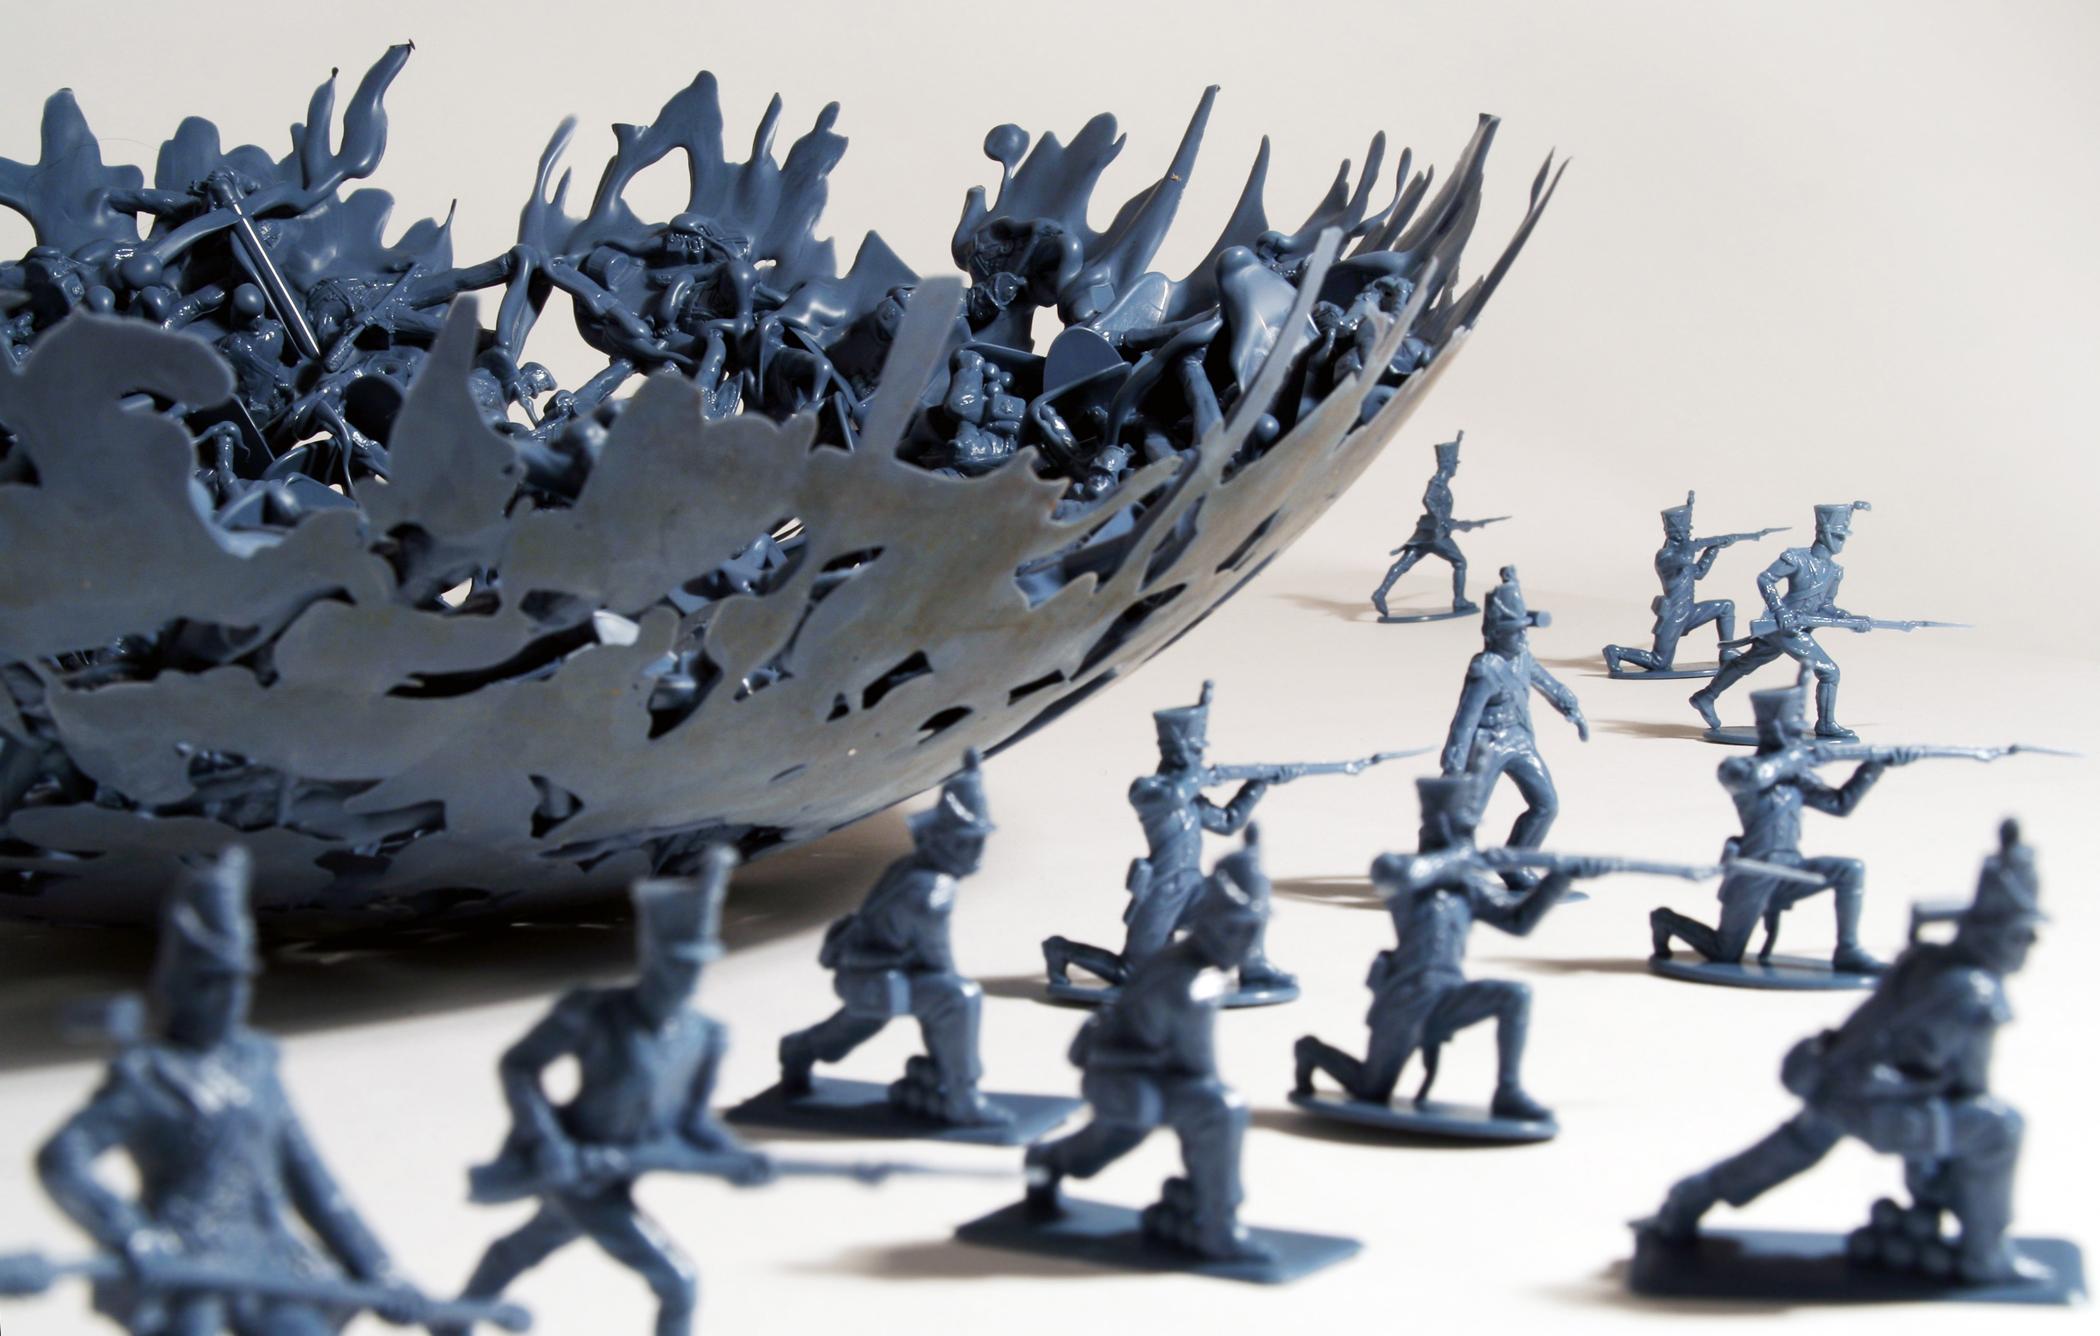 dominic_wilcox_war_bowl_green_soldiers